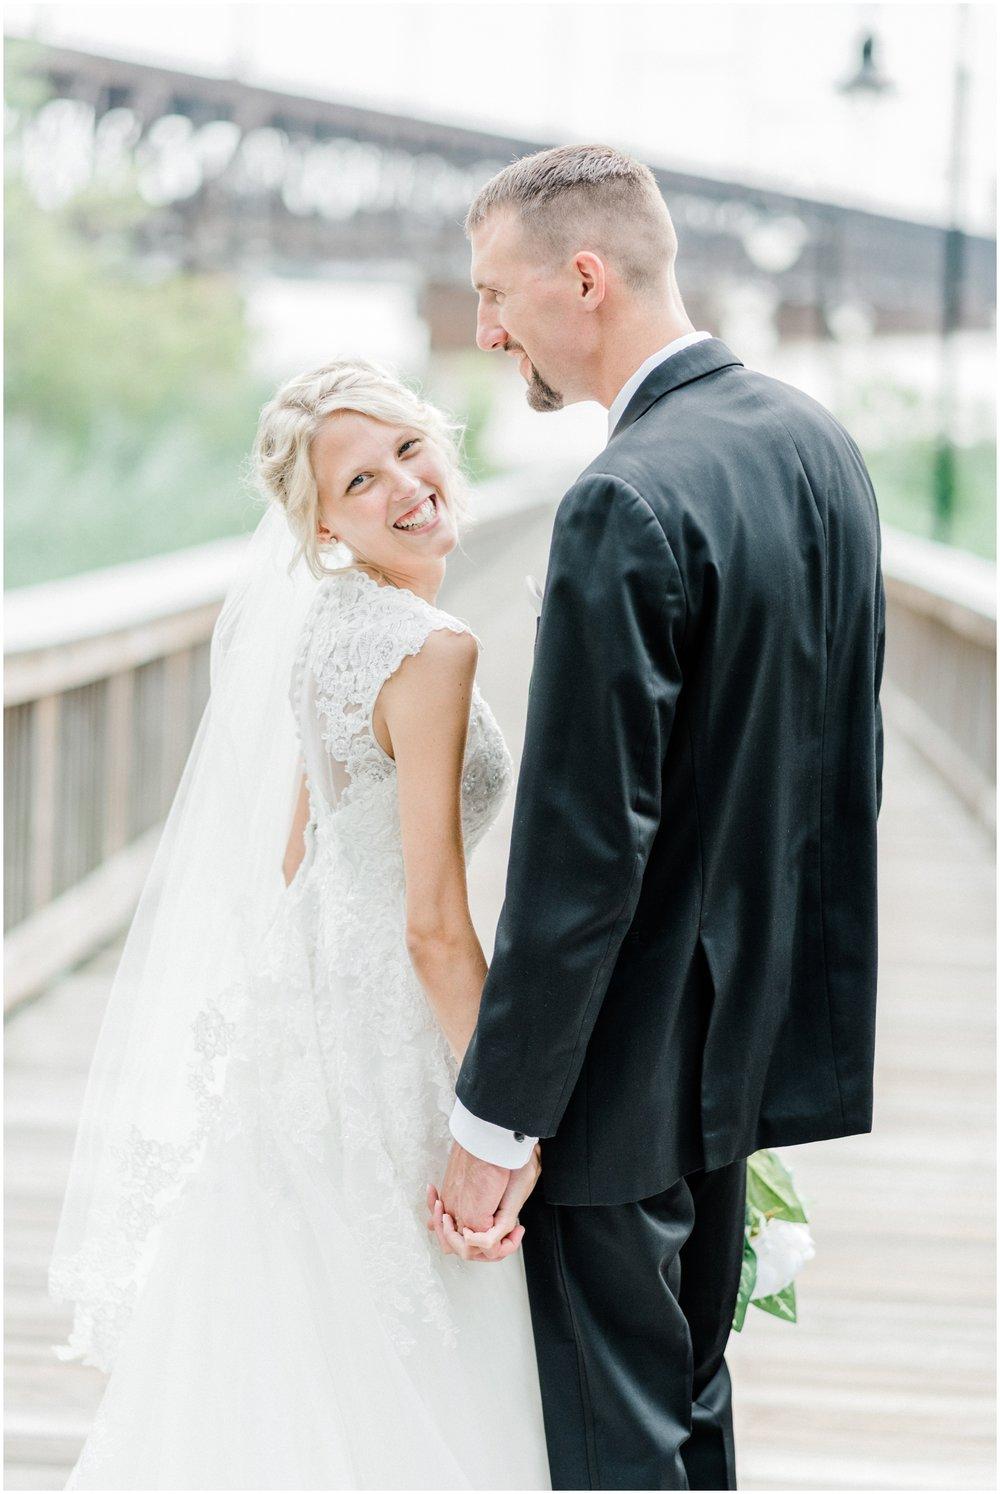 Summer Maryland Wedding - Krista Brackin Photography_0051.jpg